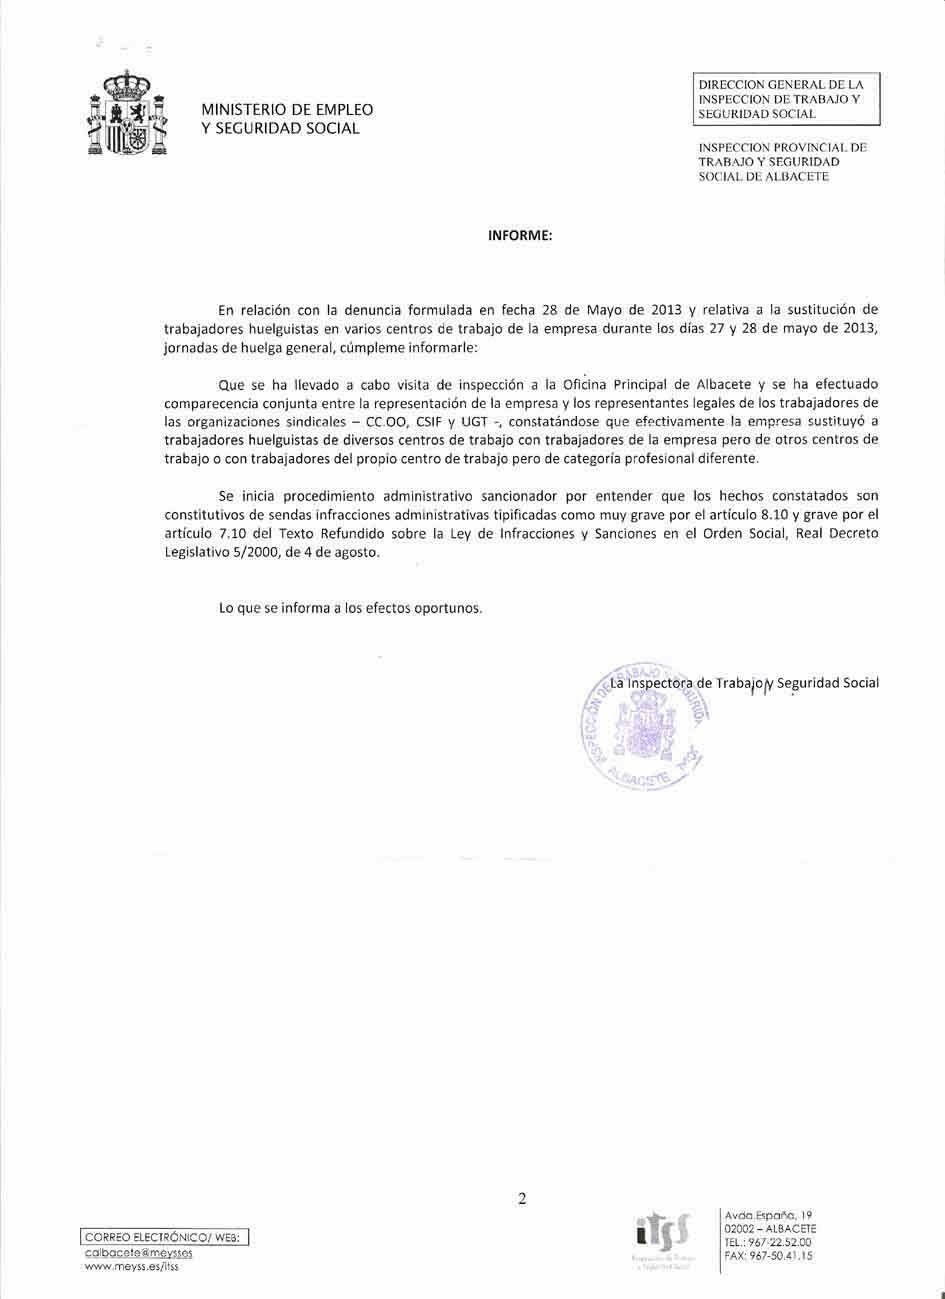 Secci n sindical de csi f en grupo liberbank comunicaciones de la inspecci n de trabajo - Fax caser bajas ...